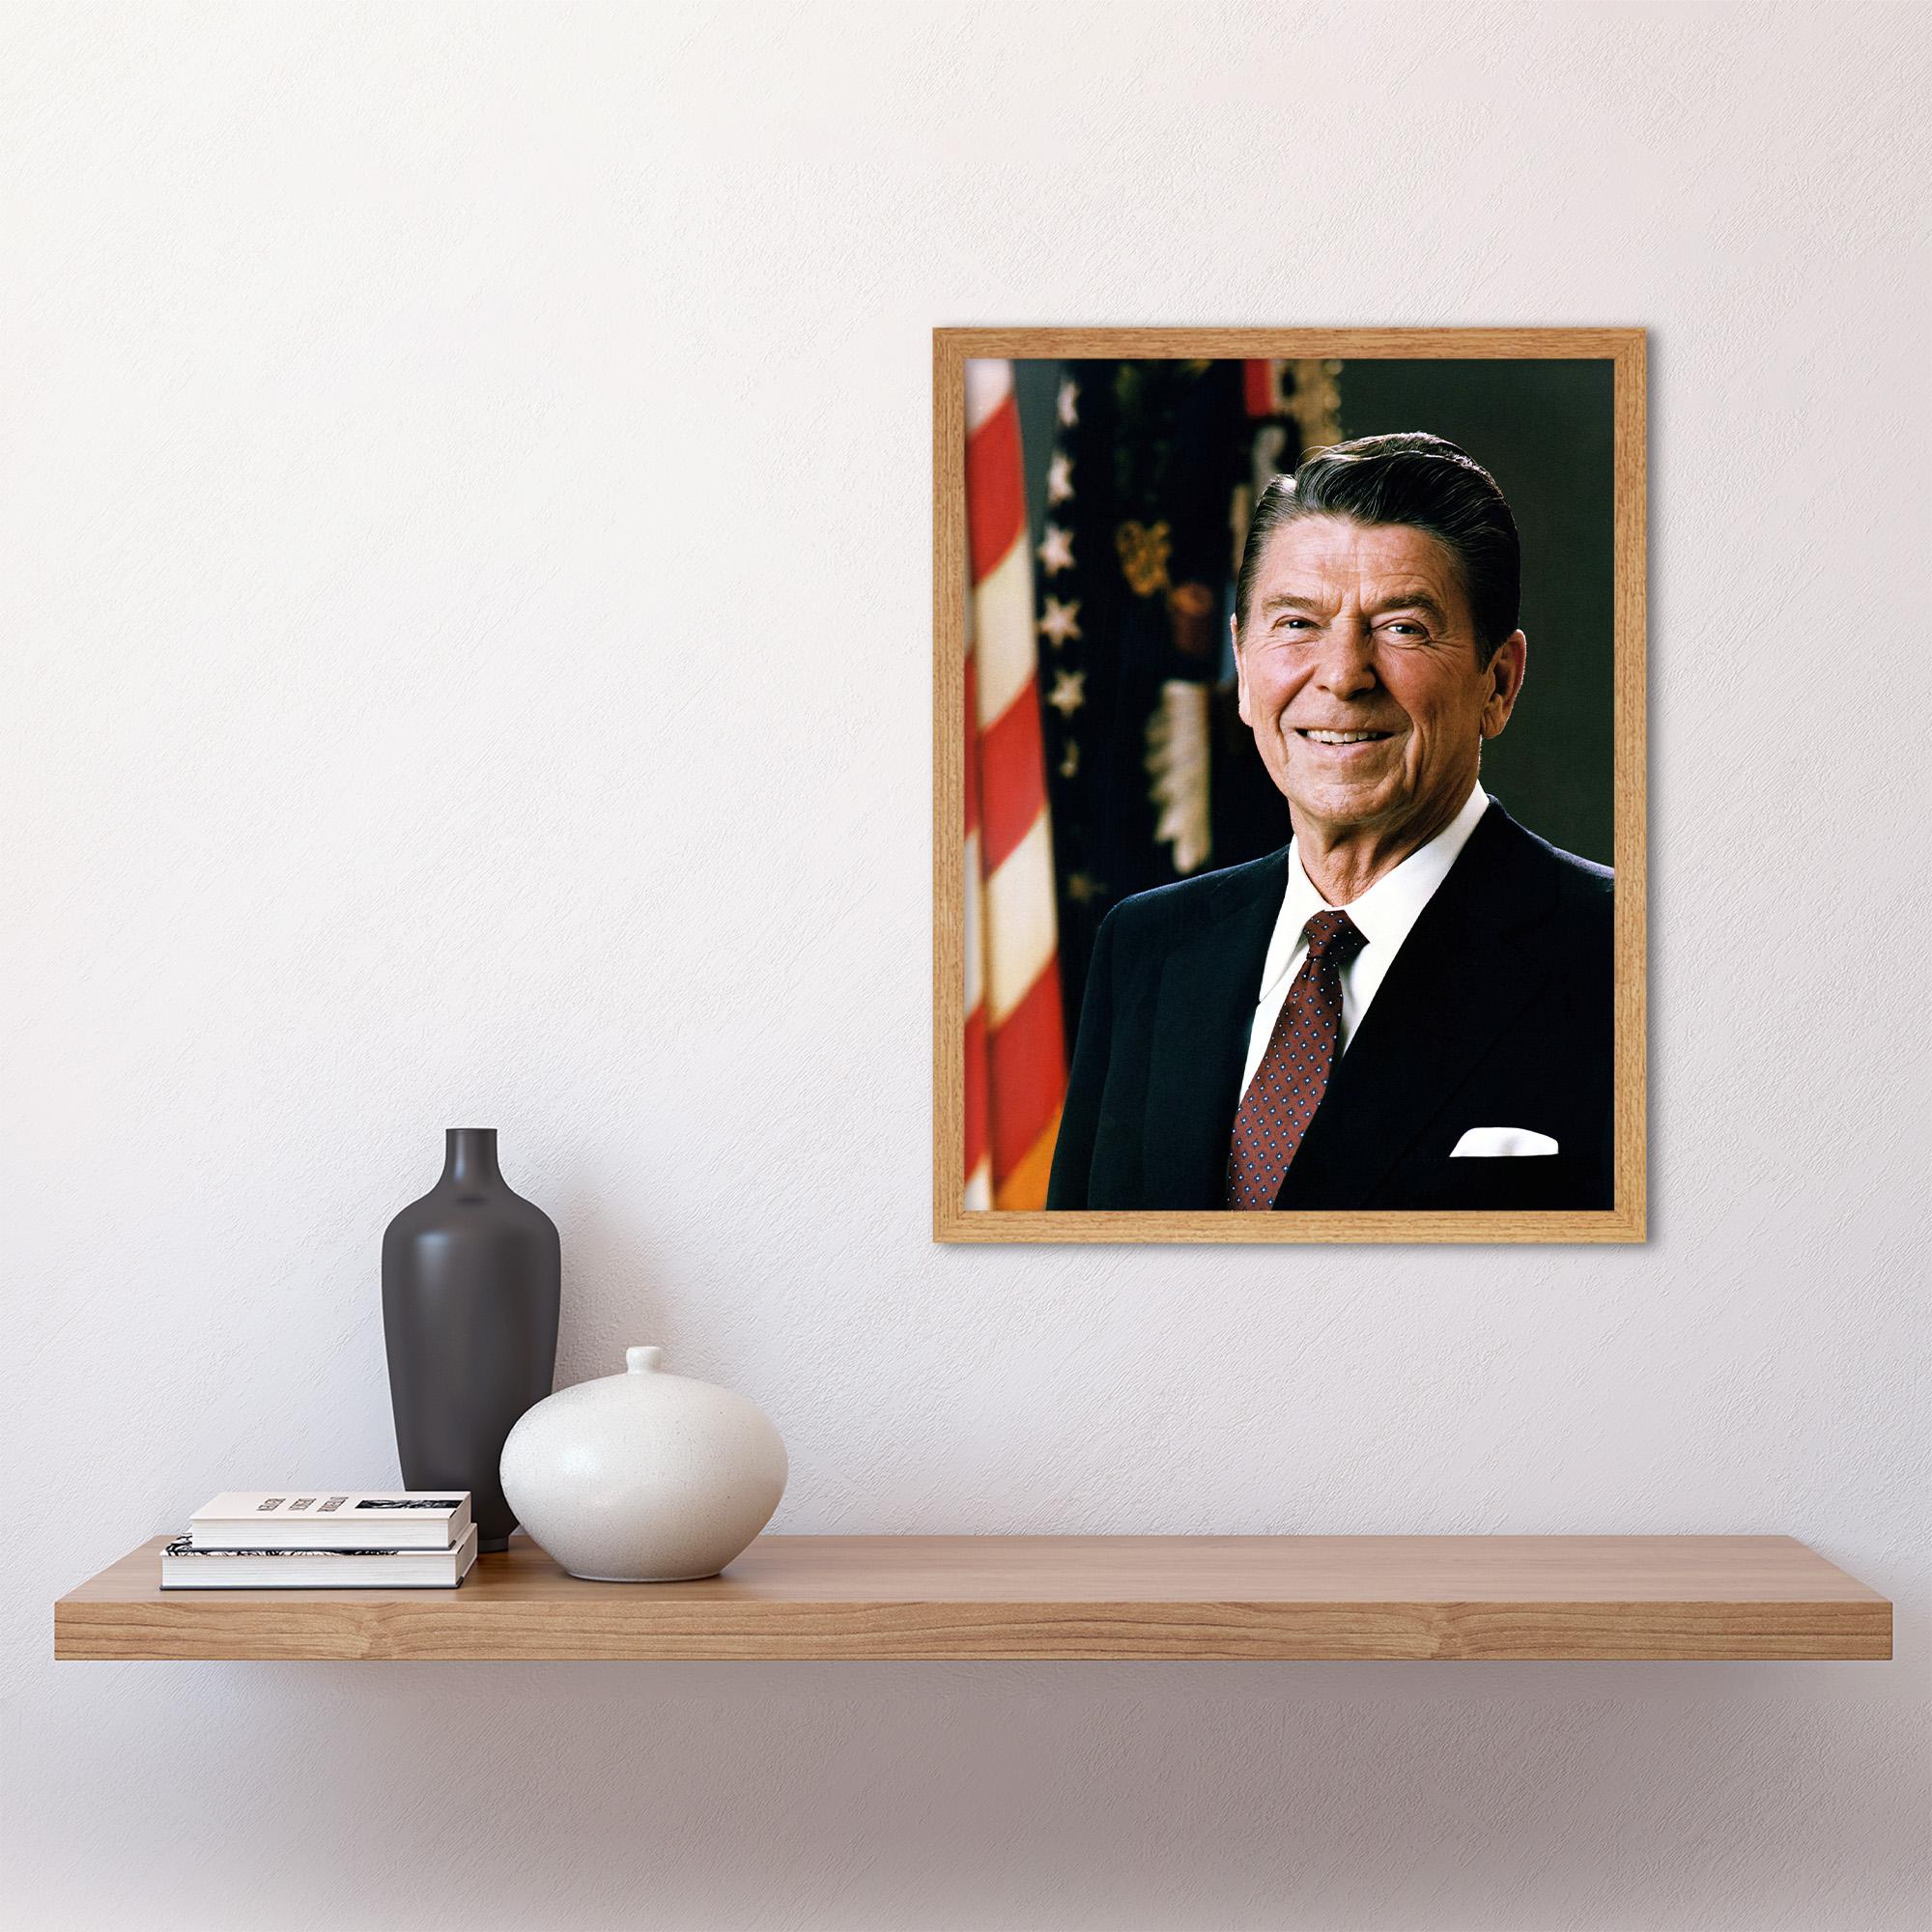 thumbnail 15 - Official-Portrait-US-President-Ronald-Reagan-Photo-Wall-Art-Print-Framed-12x16